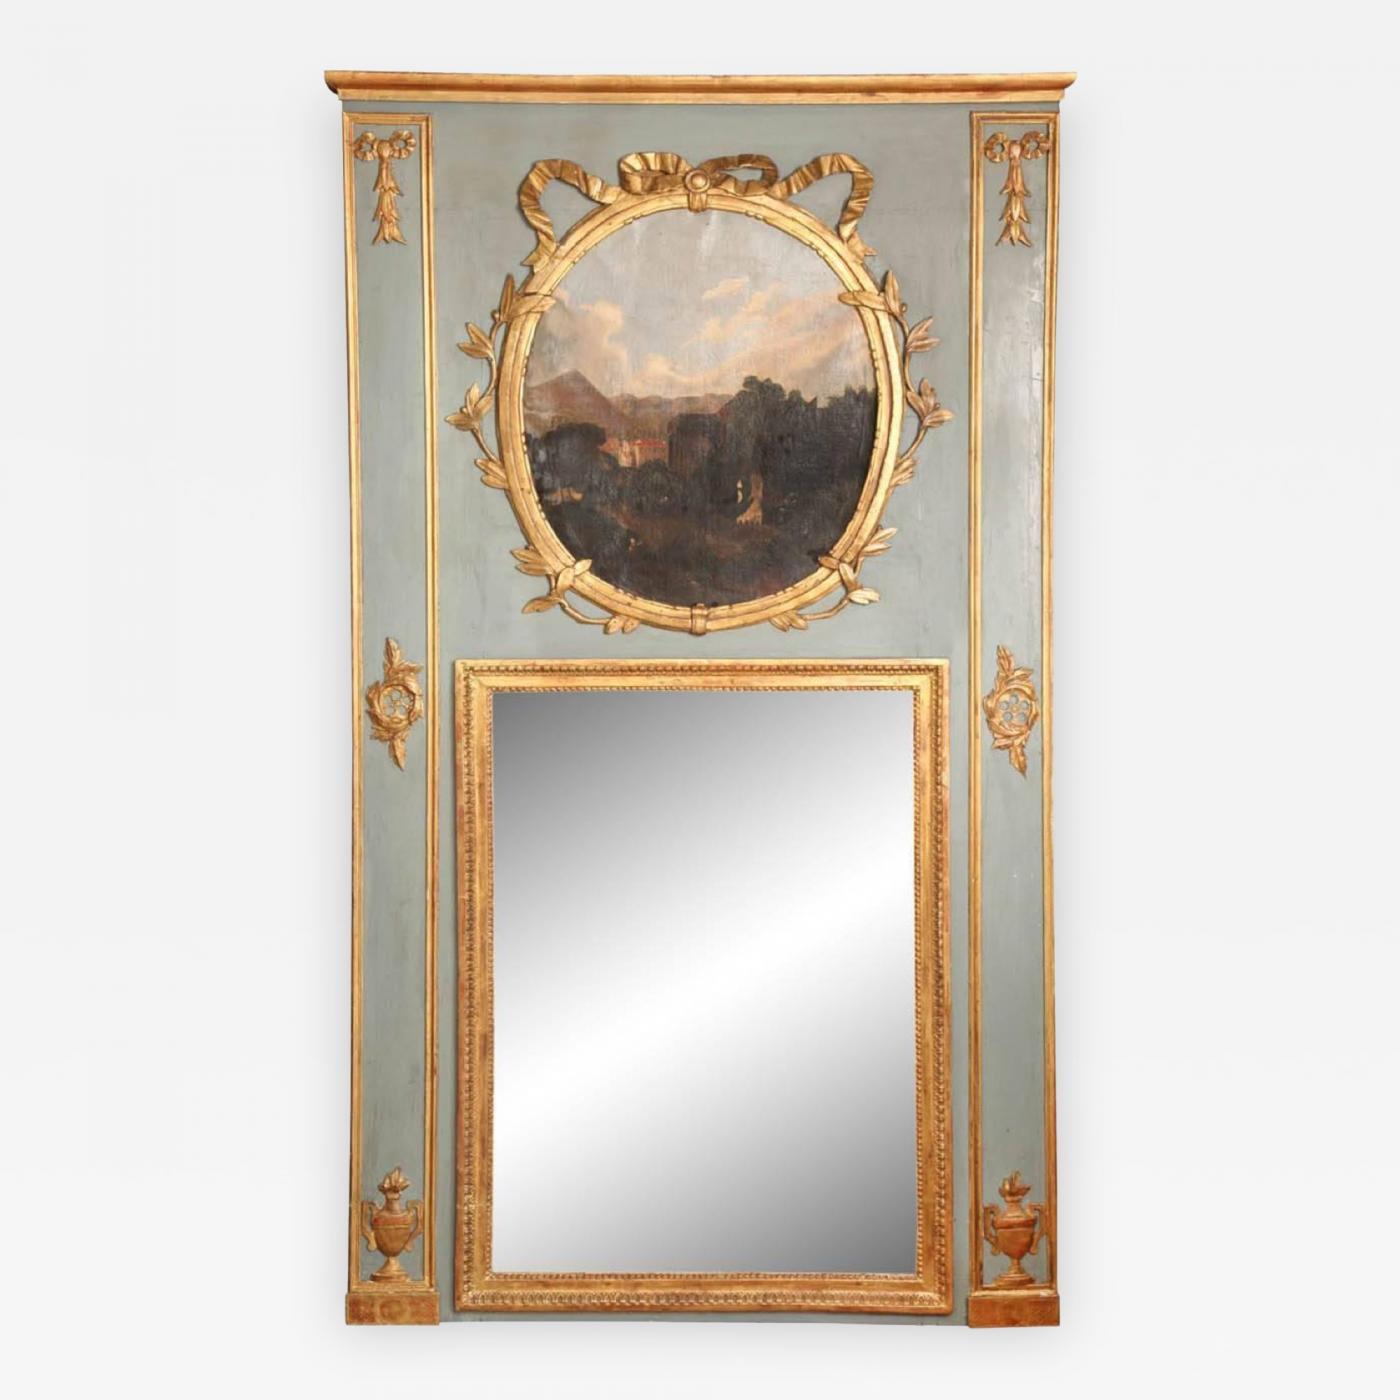 A French Louis XVI Style Trumeau Mirror